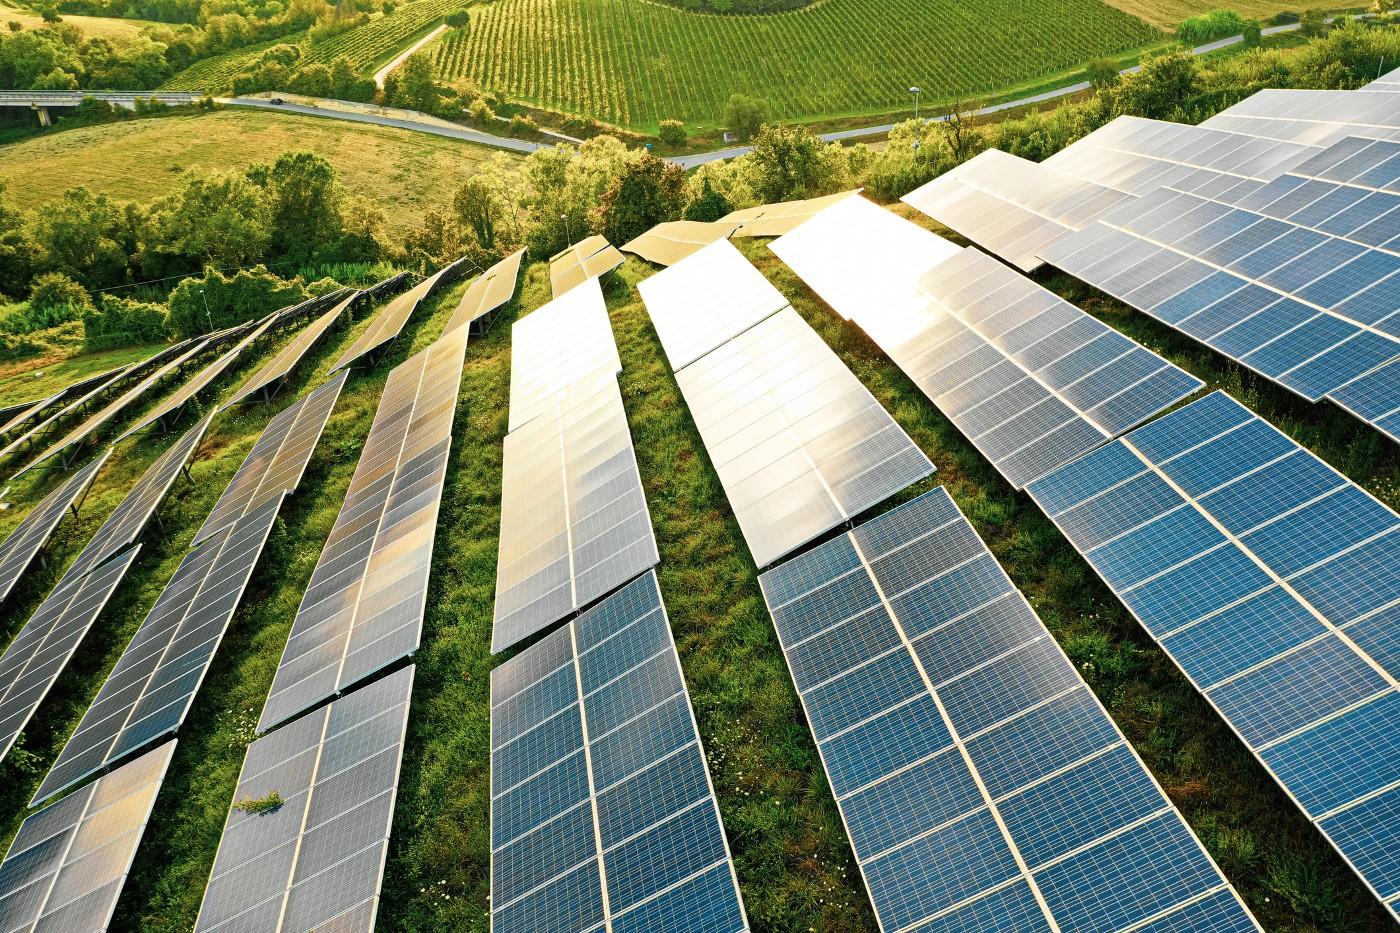 https://tickertapecdn.tdameritrade.com/assets/images/pages/md/Solar farm: Biden's infrastructure plan